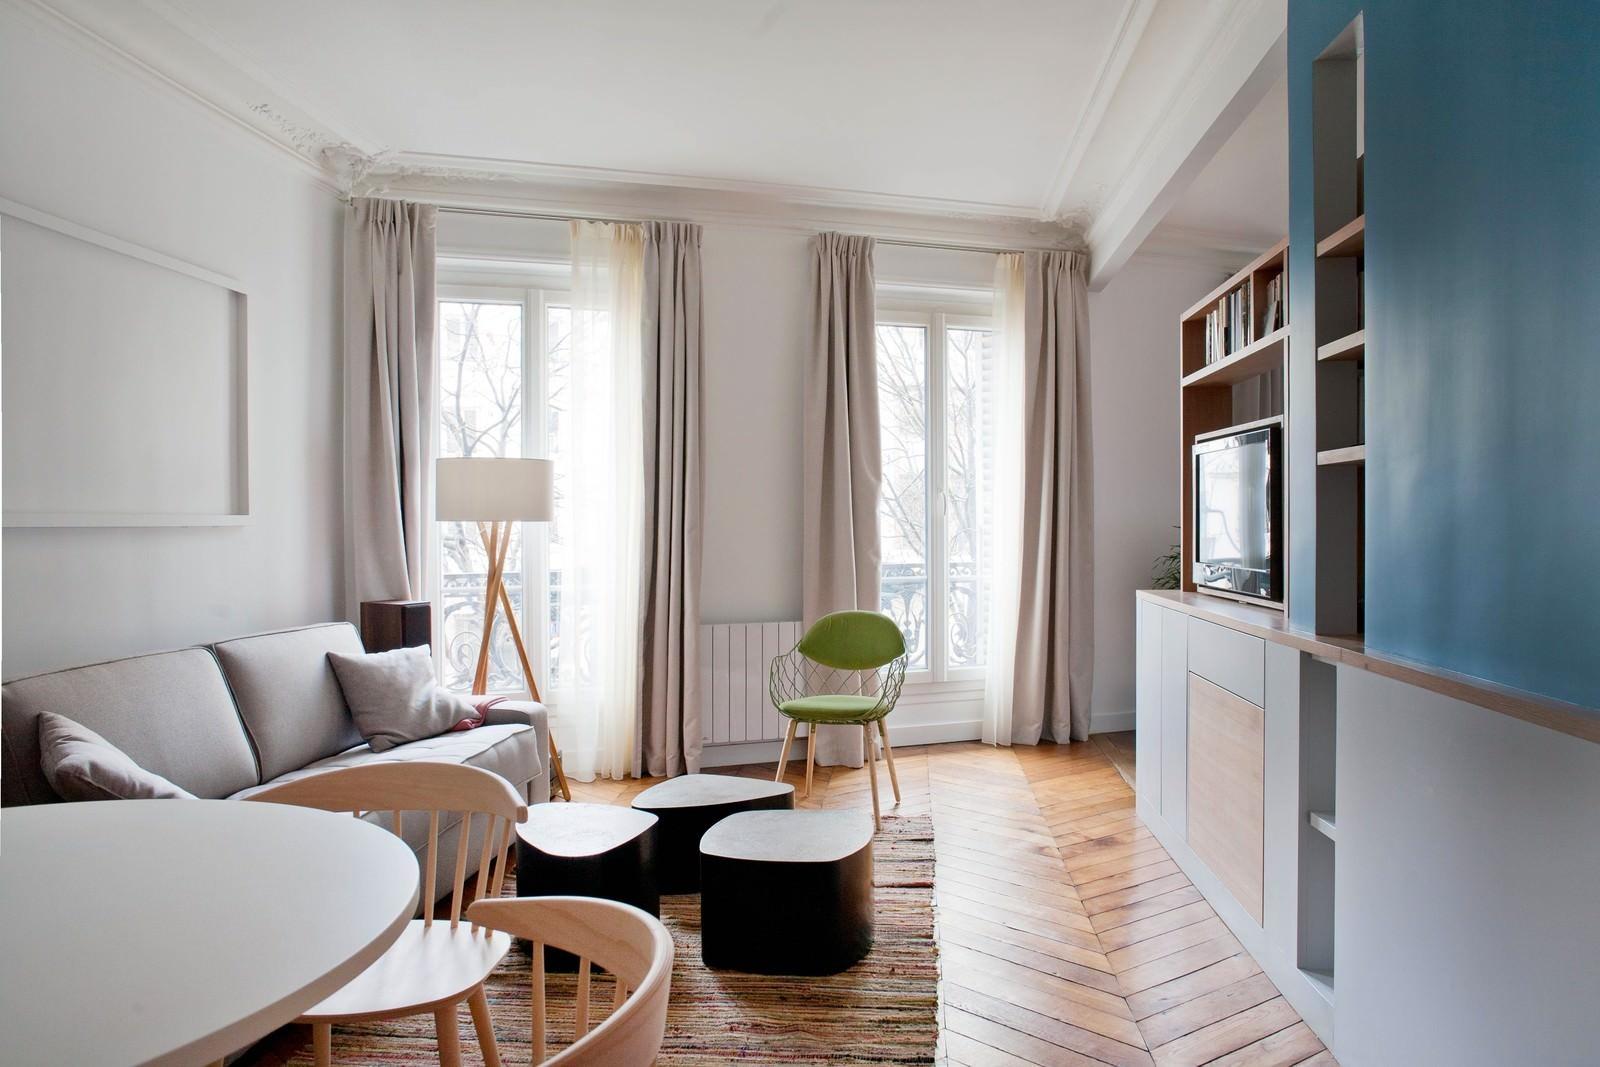 proektat-za-malak-semeen-apartament-v-parij-4g